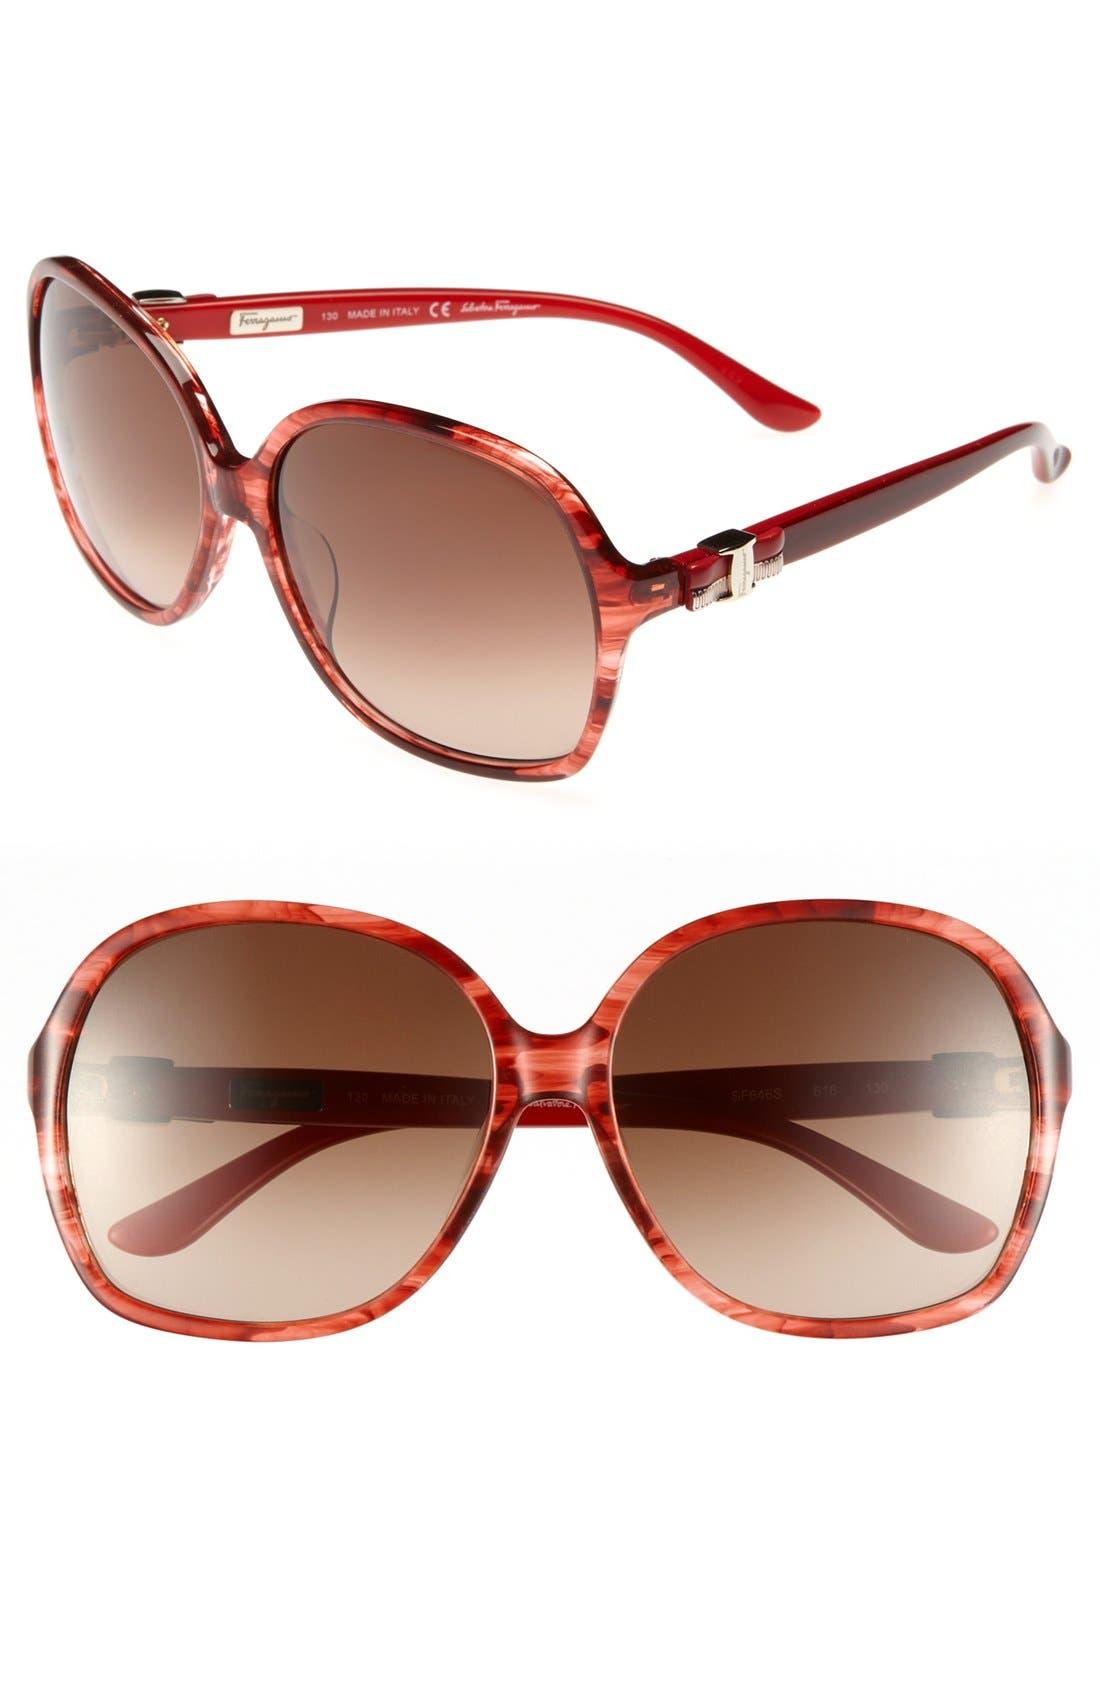 Main Image - Salvatore Ferragamo 59mm Oversized Sunglasses